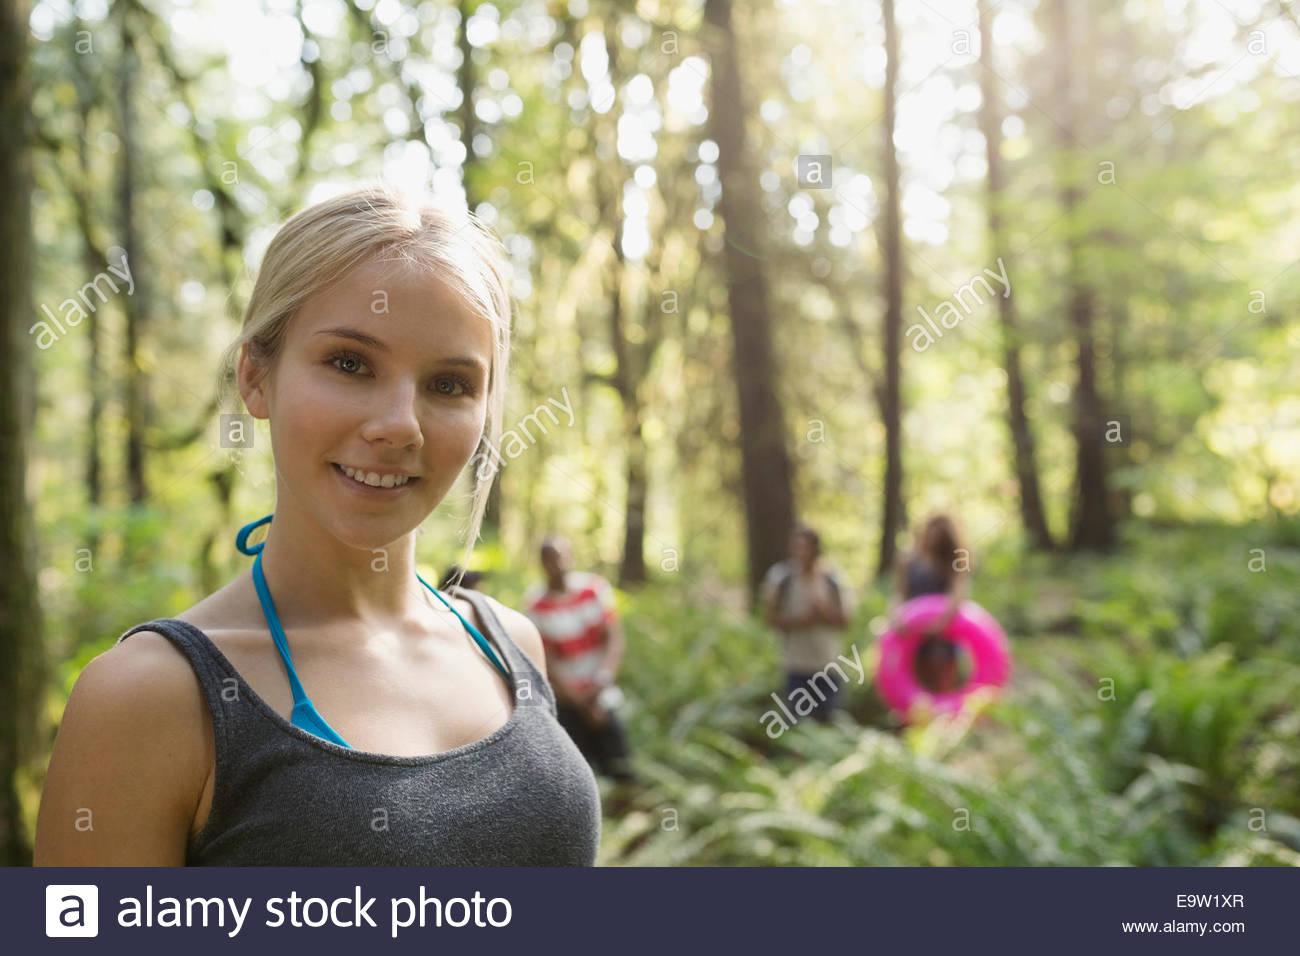 Porträt der lächelnde junge Frau im Wald Stockbild